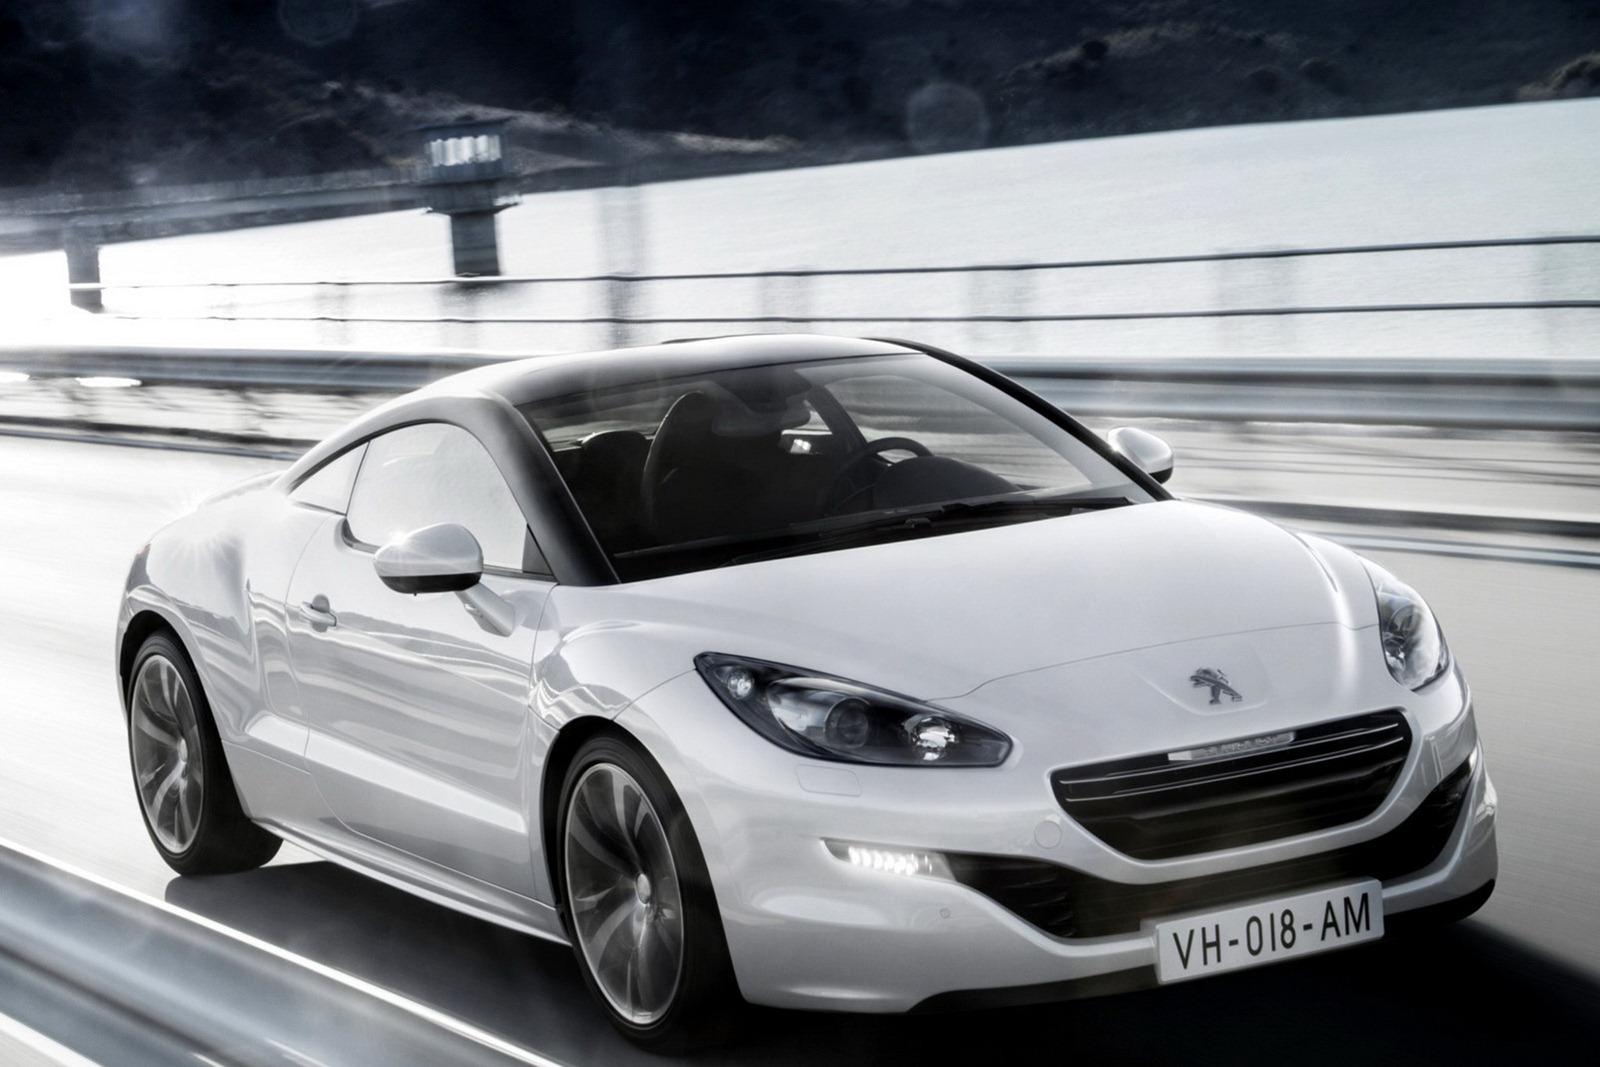 Peugeot_RCZ_Facelift_01